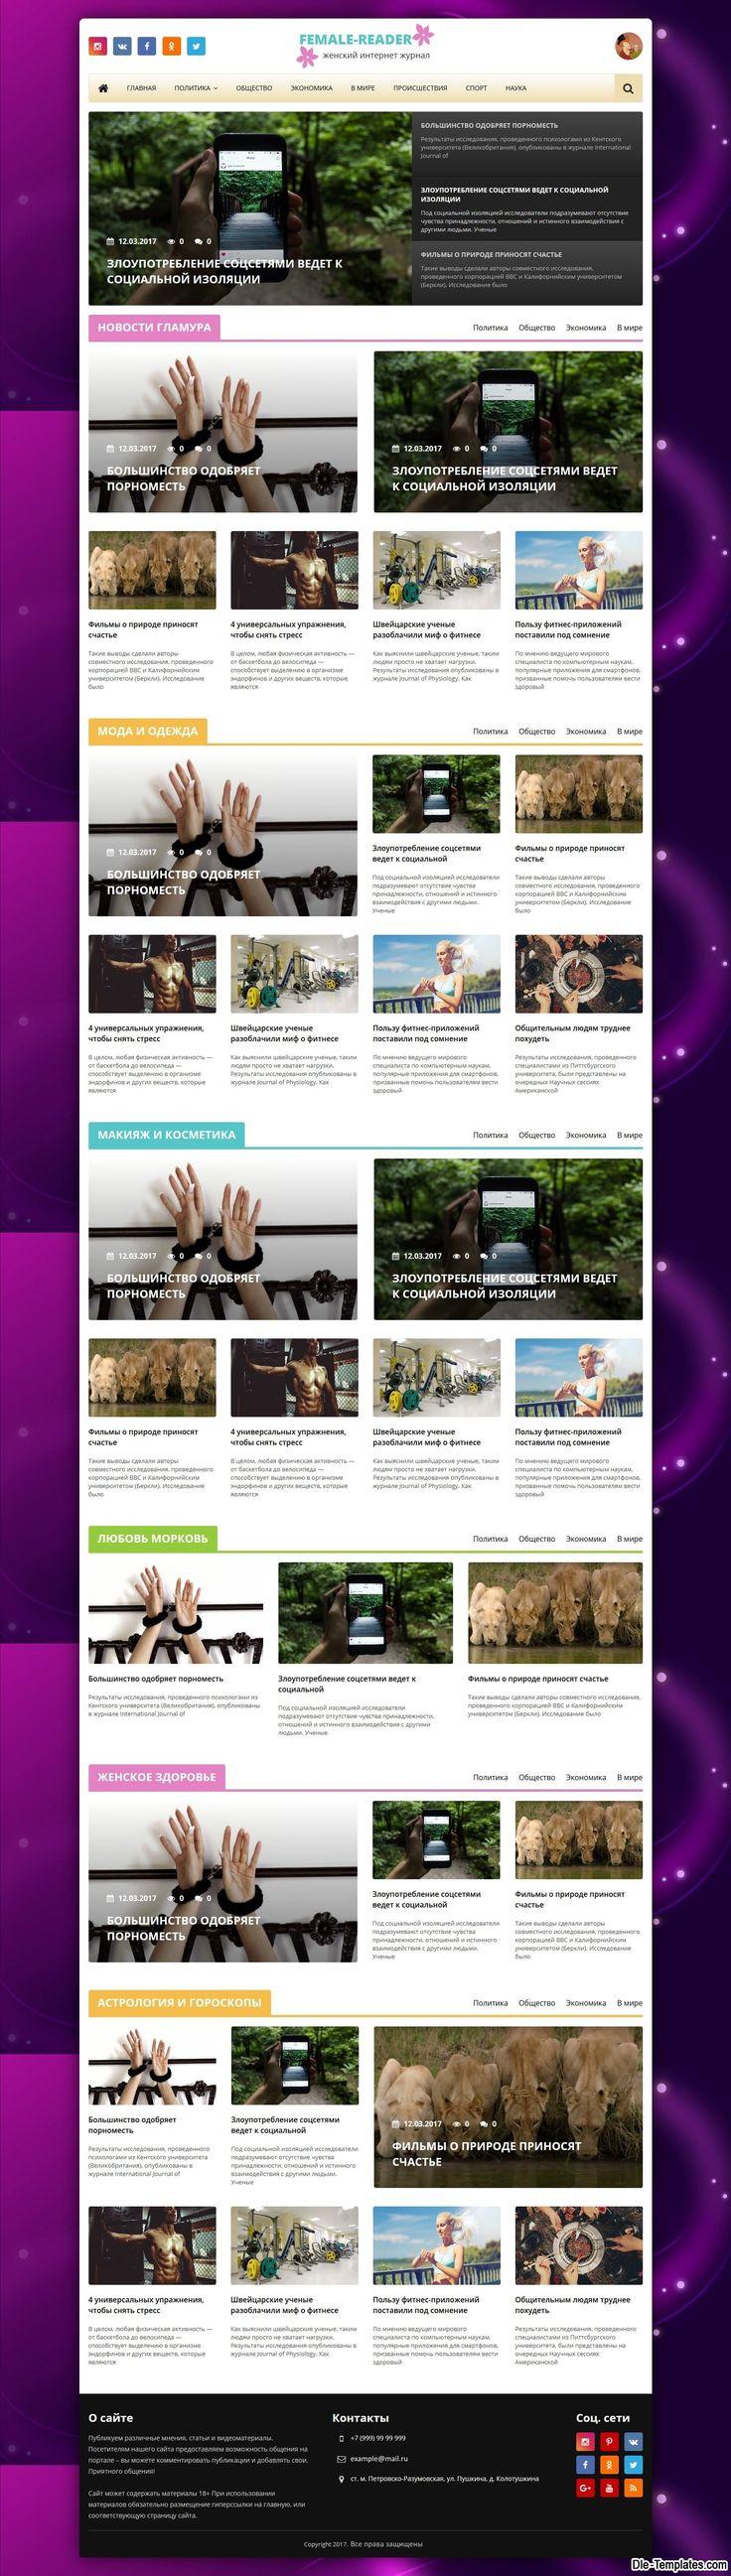 Super Reader - 4 адаптивных шаблона на разную тему #templates #website #шаблон #сайт #web